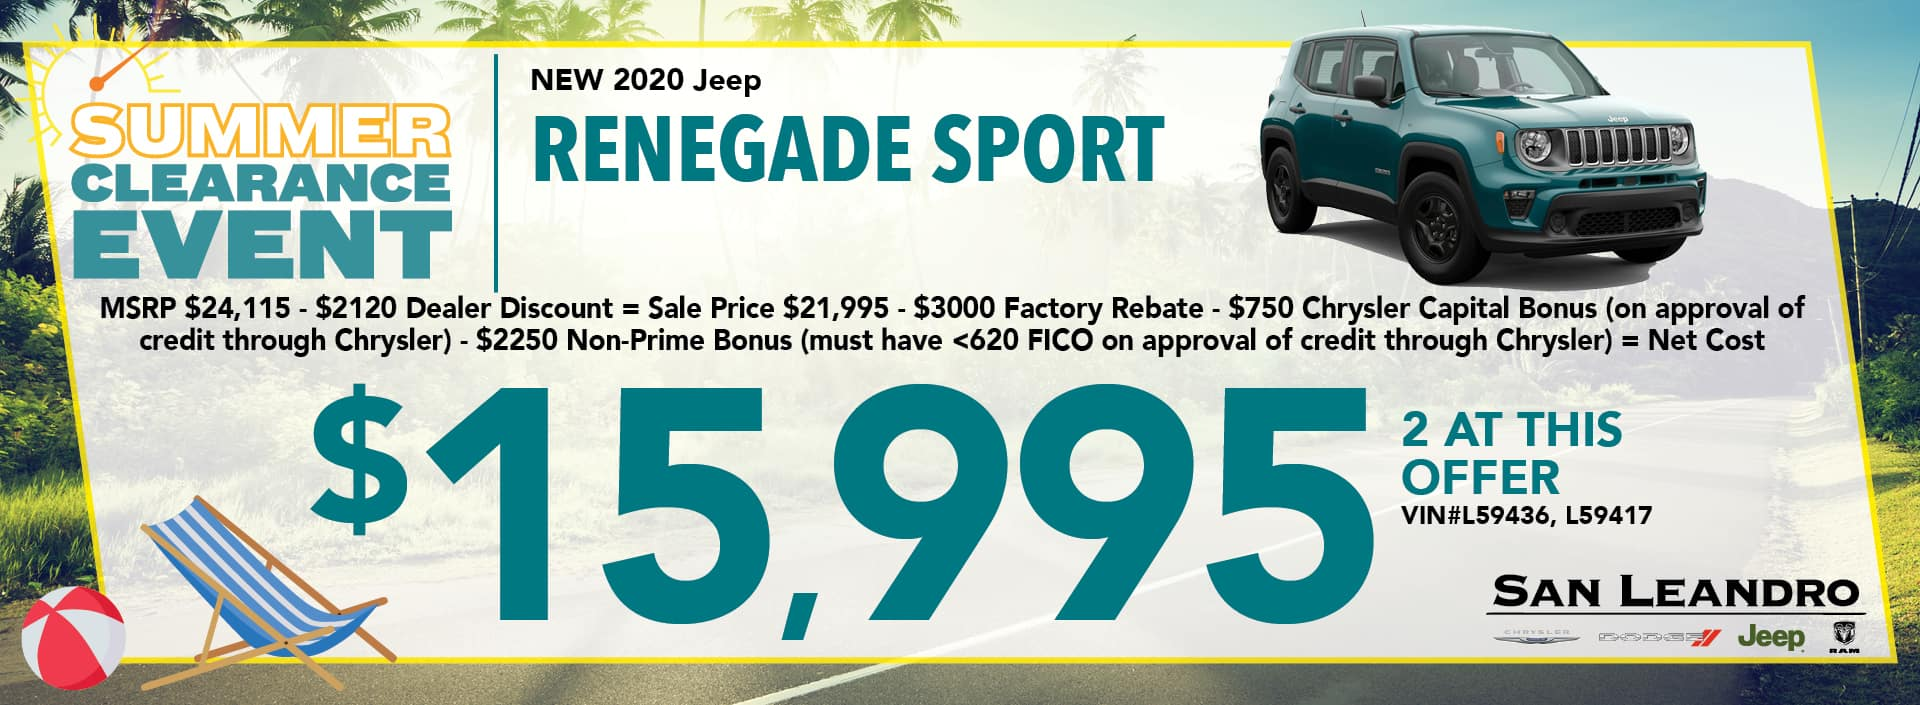 Renegade Sport